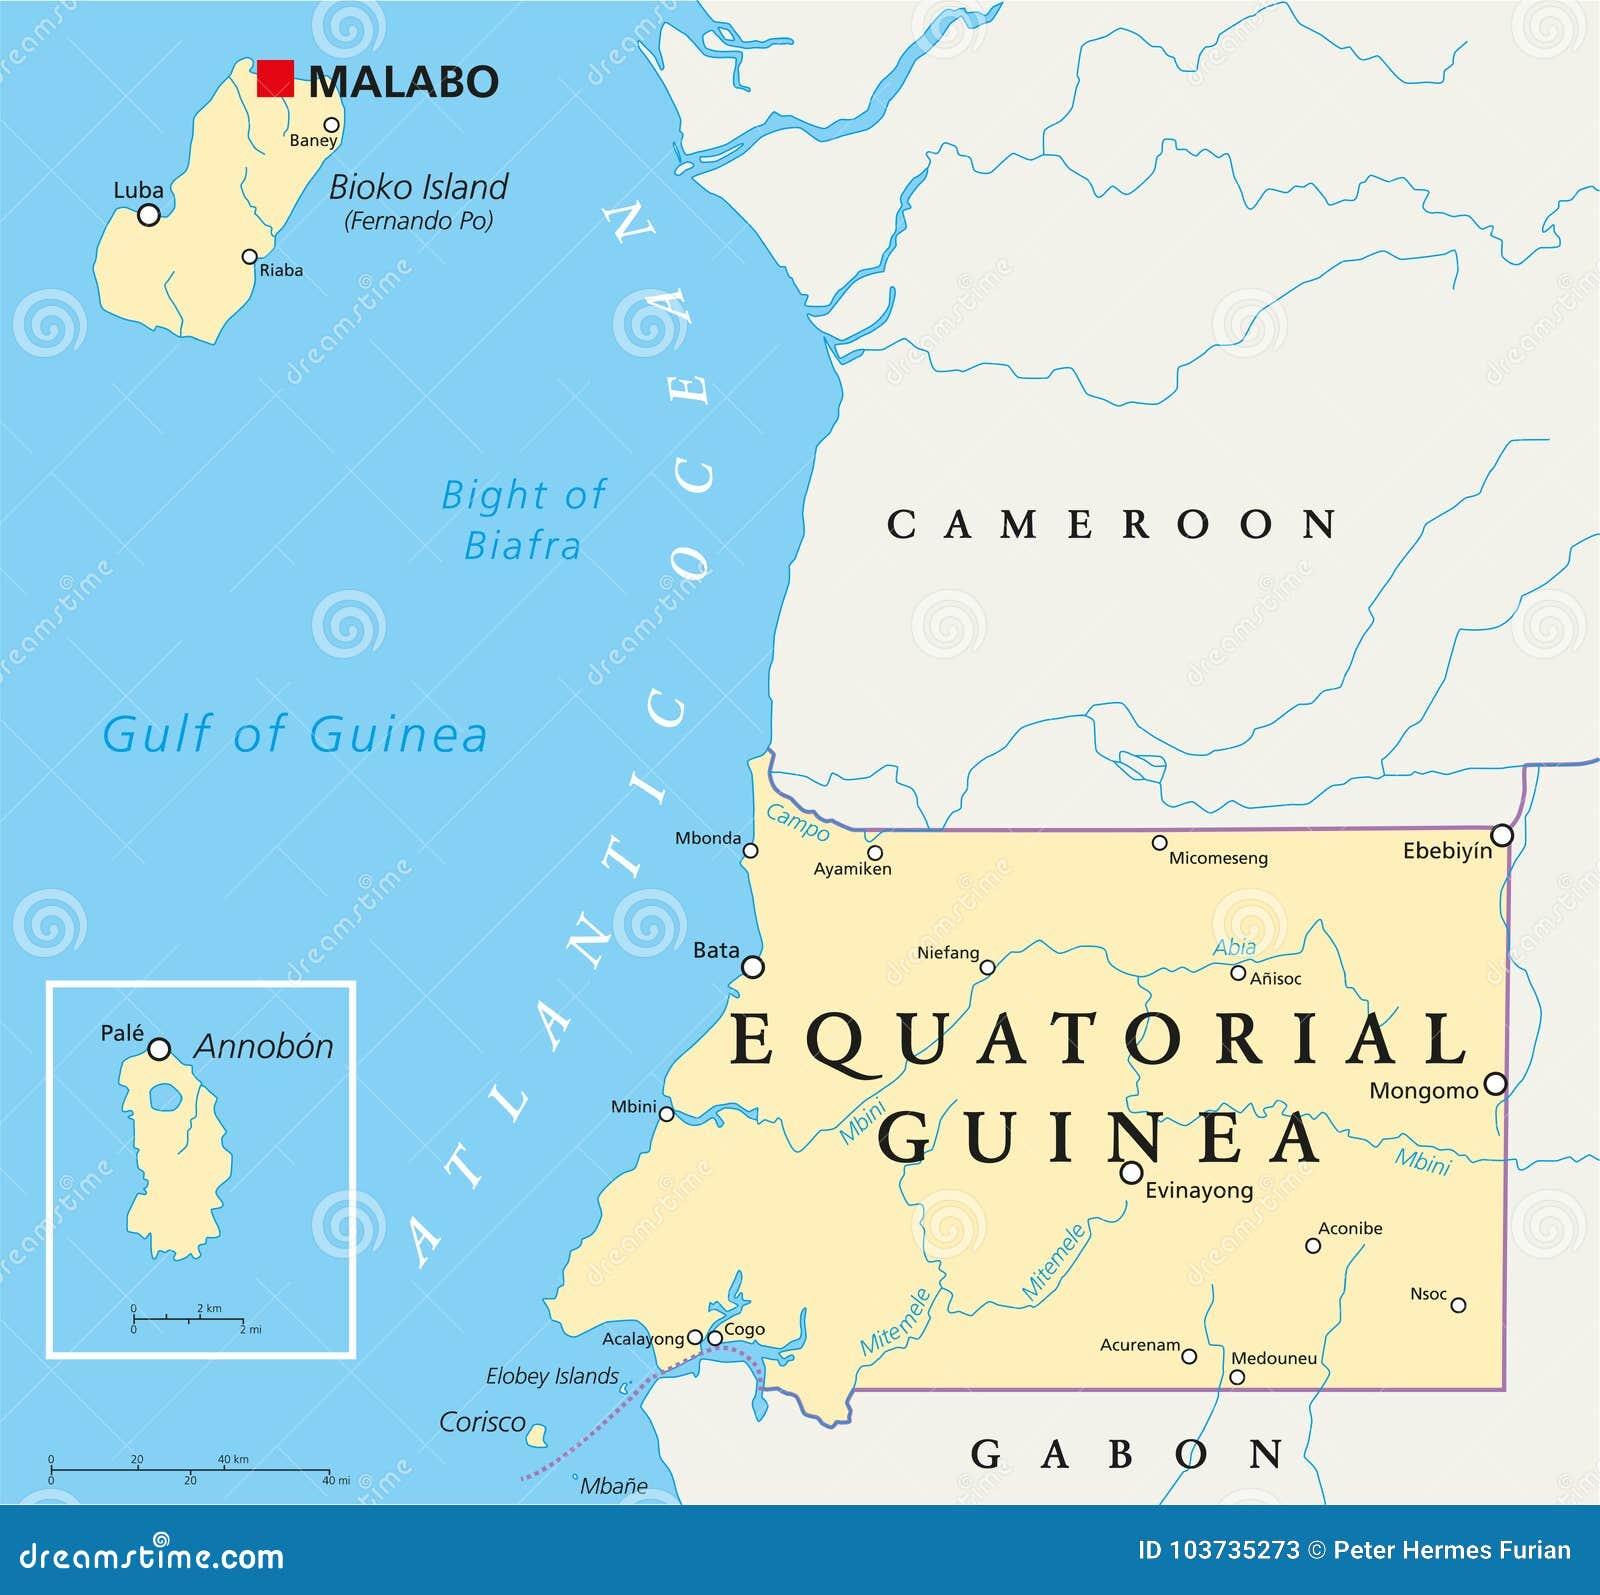 Equatorial Guinea Political Map Stock Vector - Illustration of ...